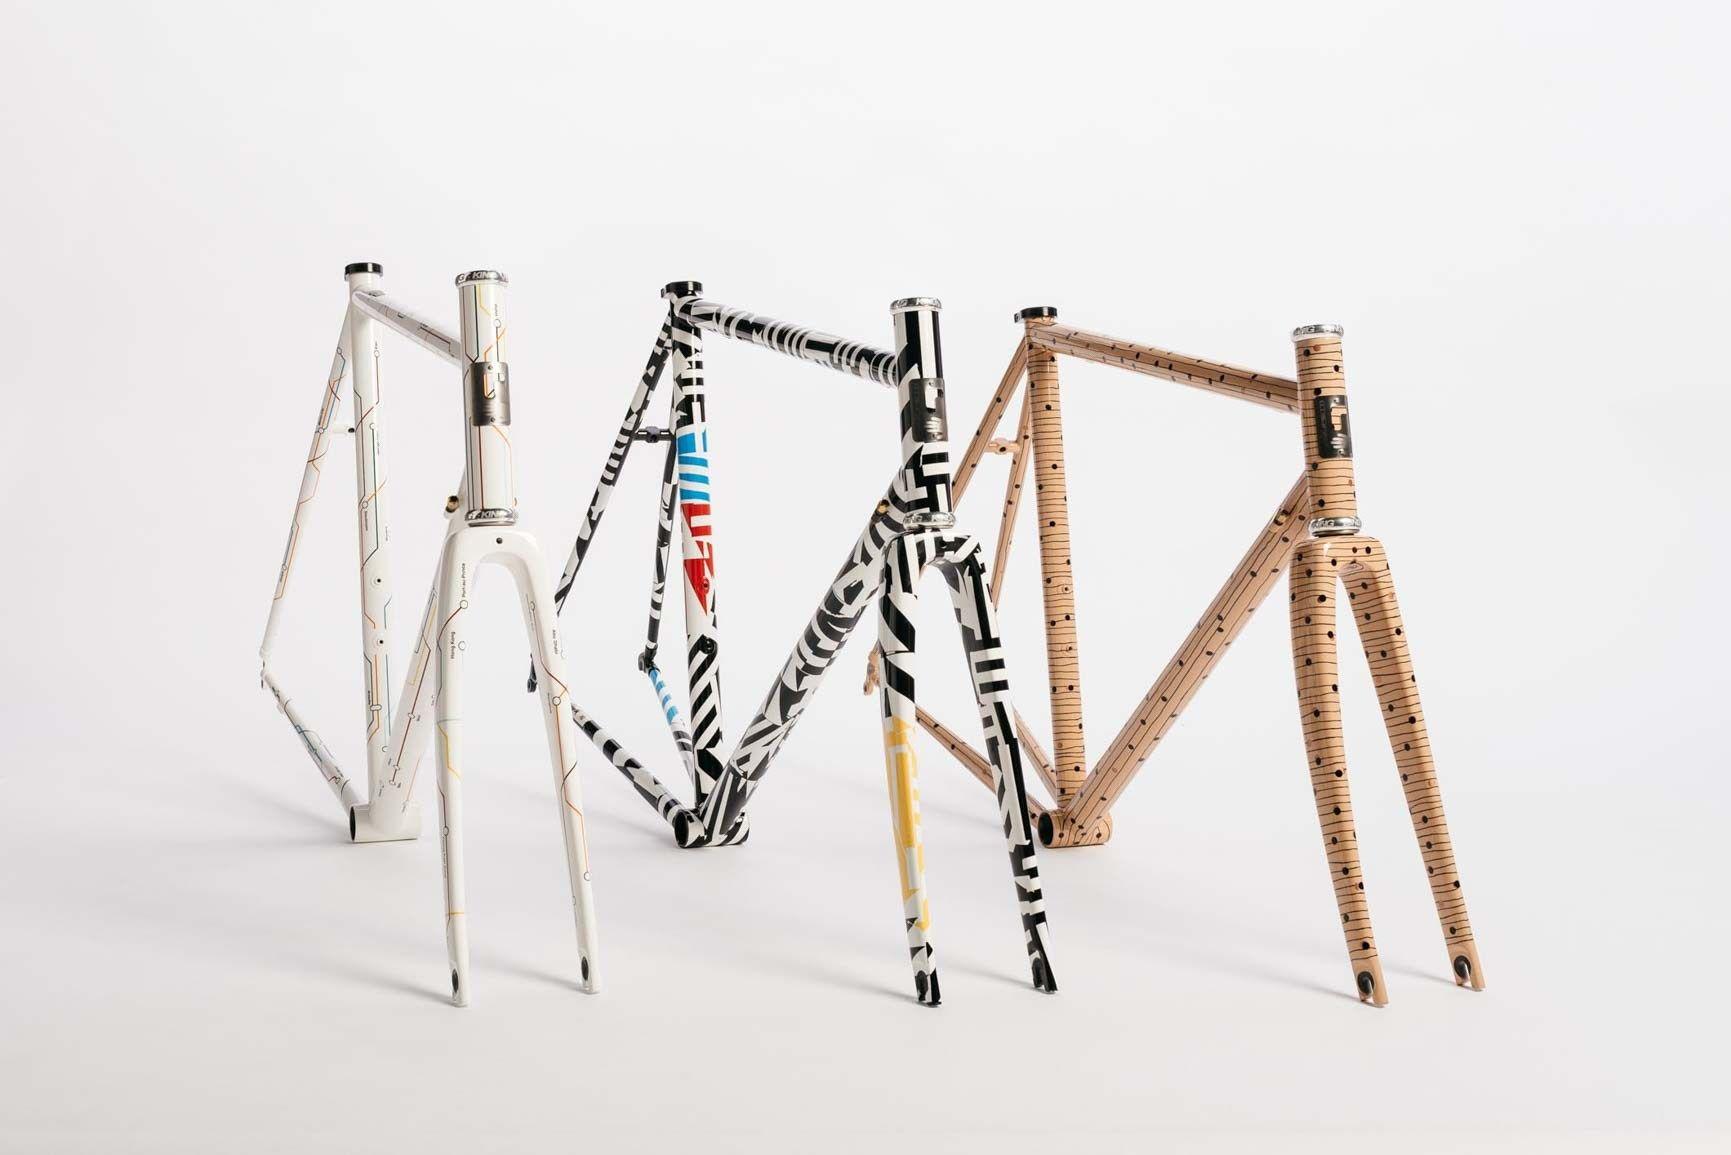 3 Stahlrahmen Unikate von Dario Pegoretti. Der Rahmenbau-Meister ...